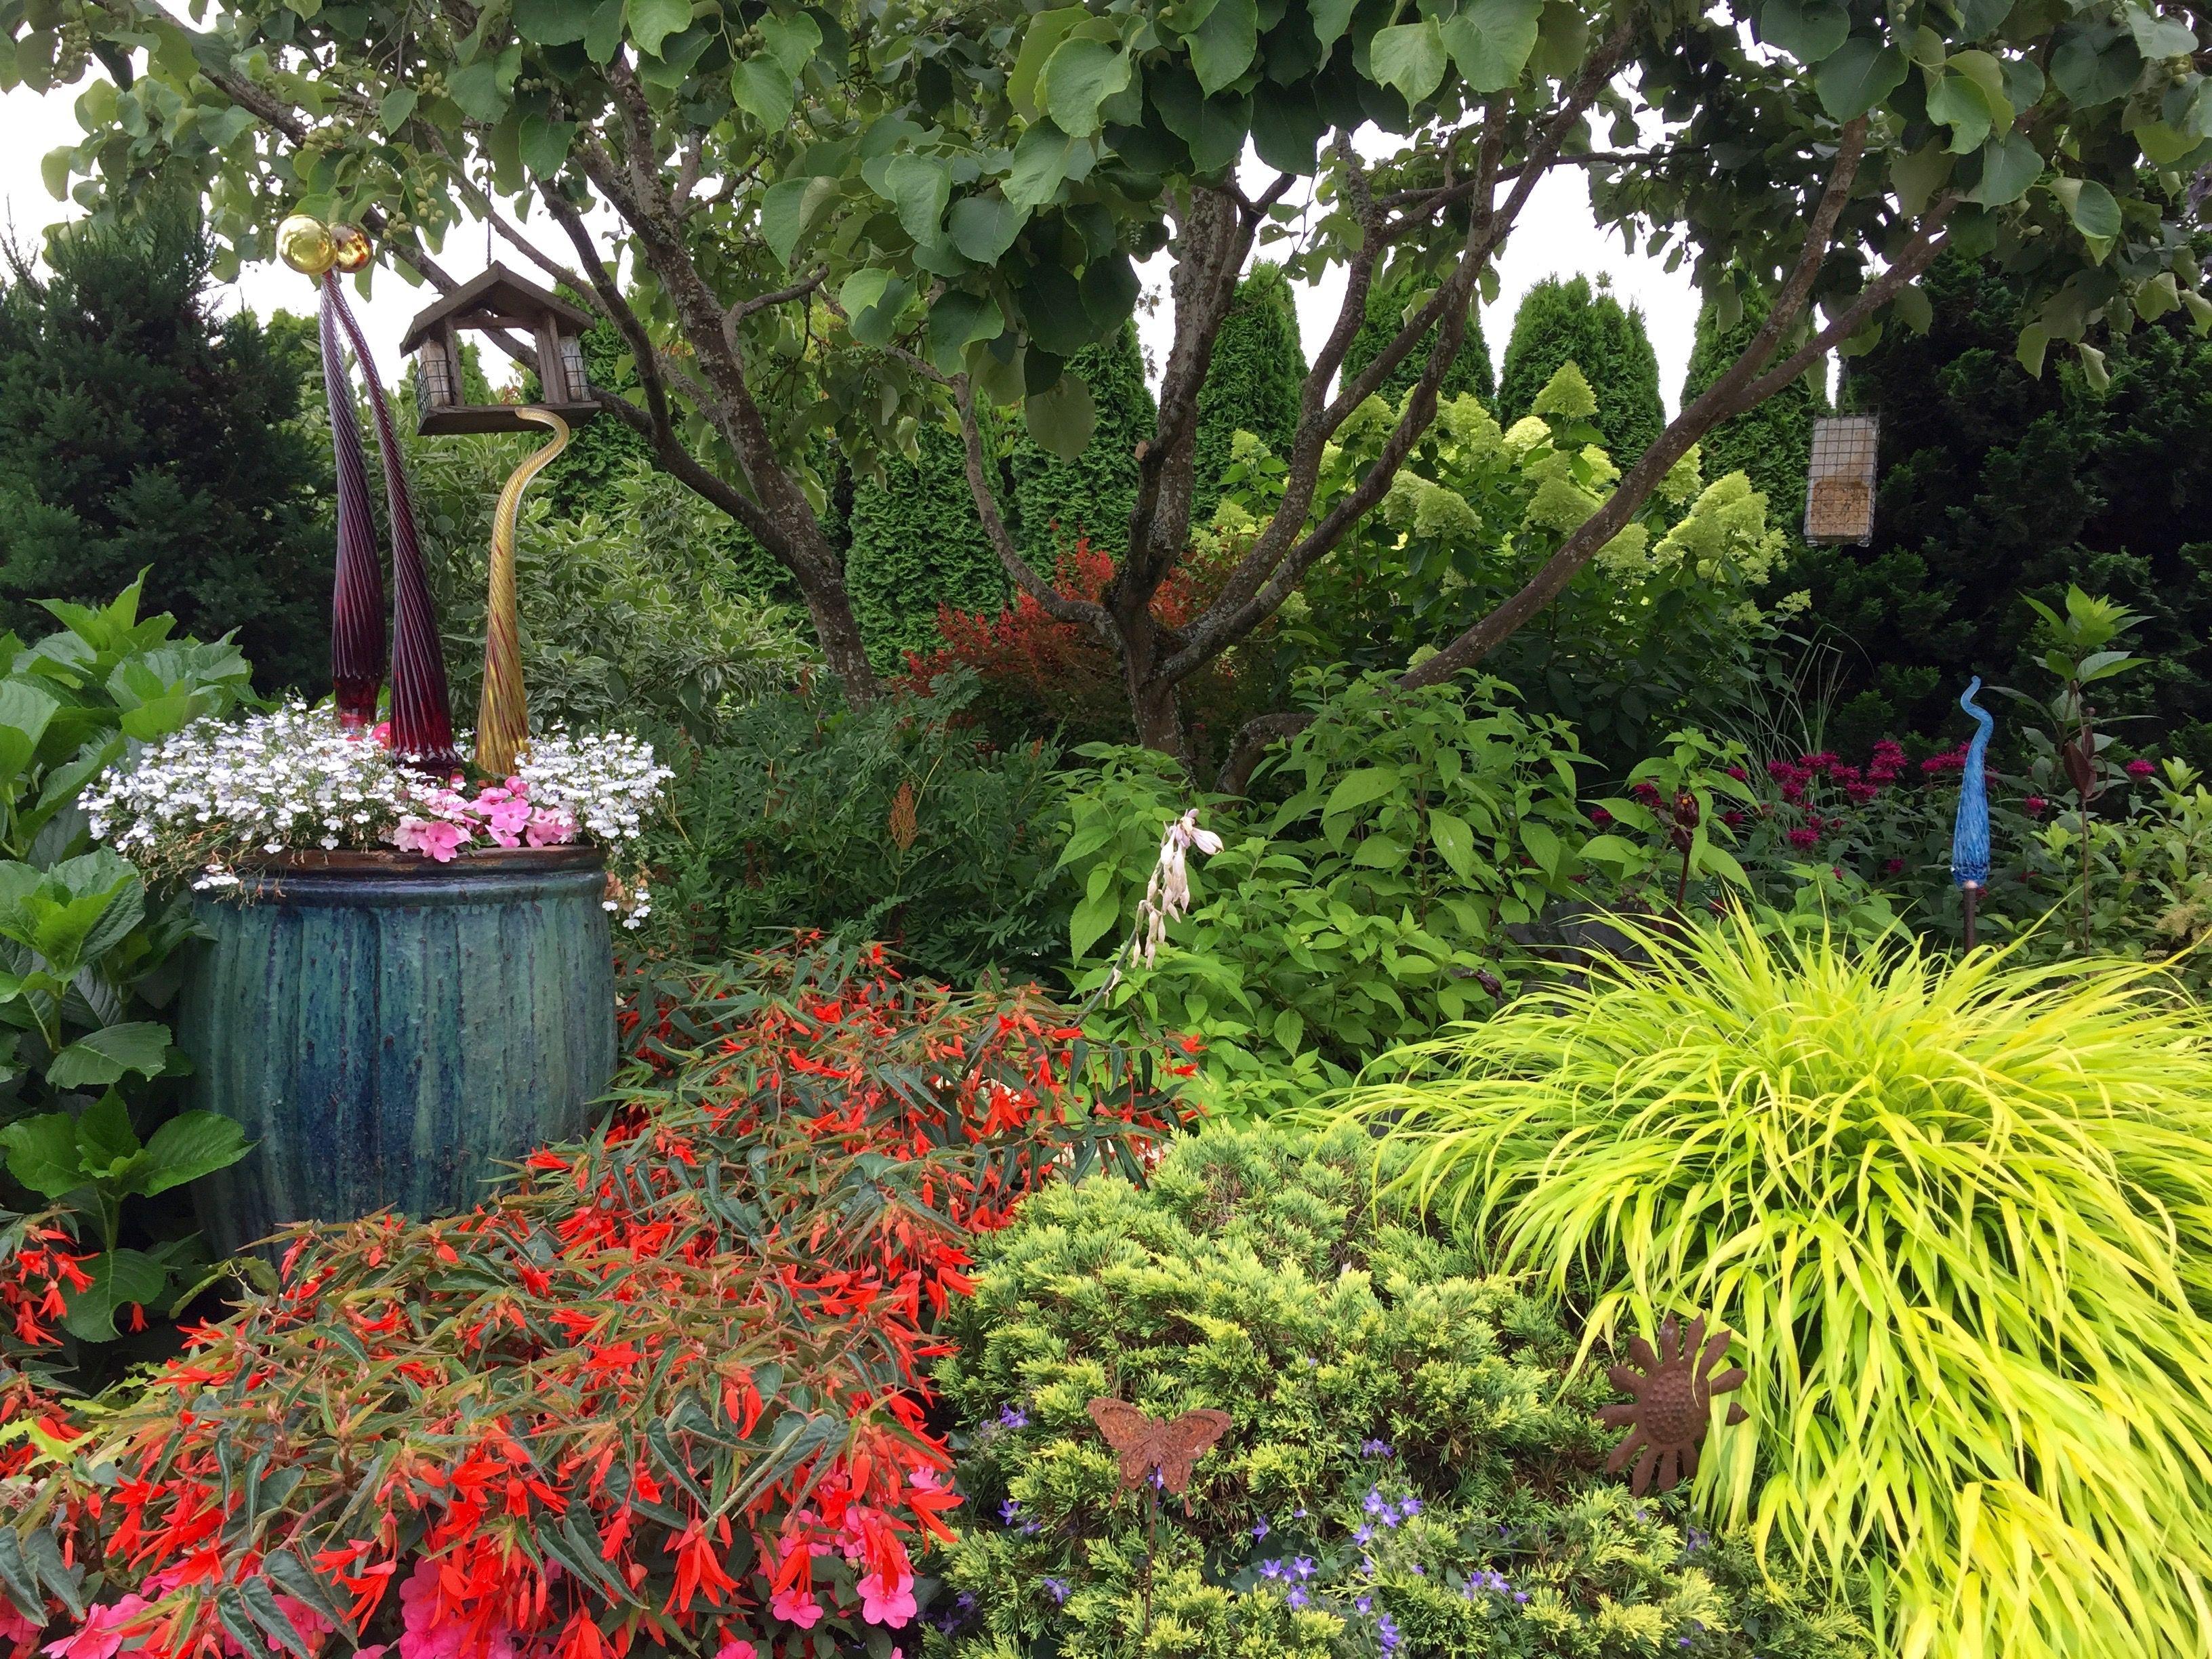 Sunnyside Nursery display gardens | love & grow | Pinterest ...